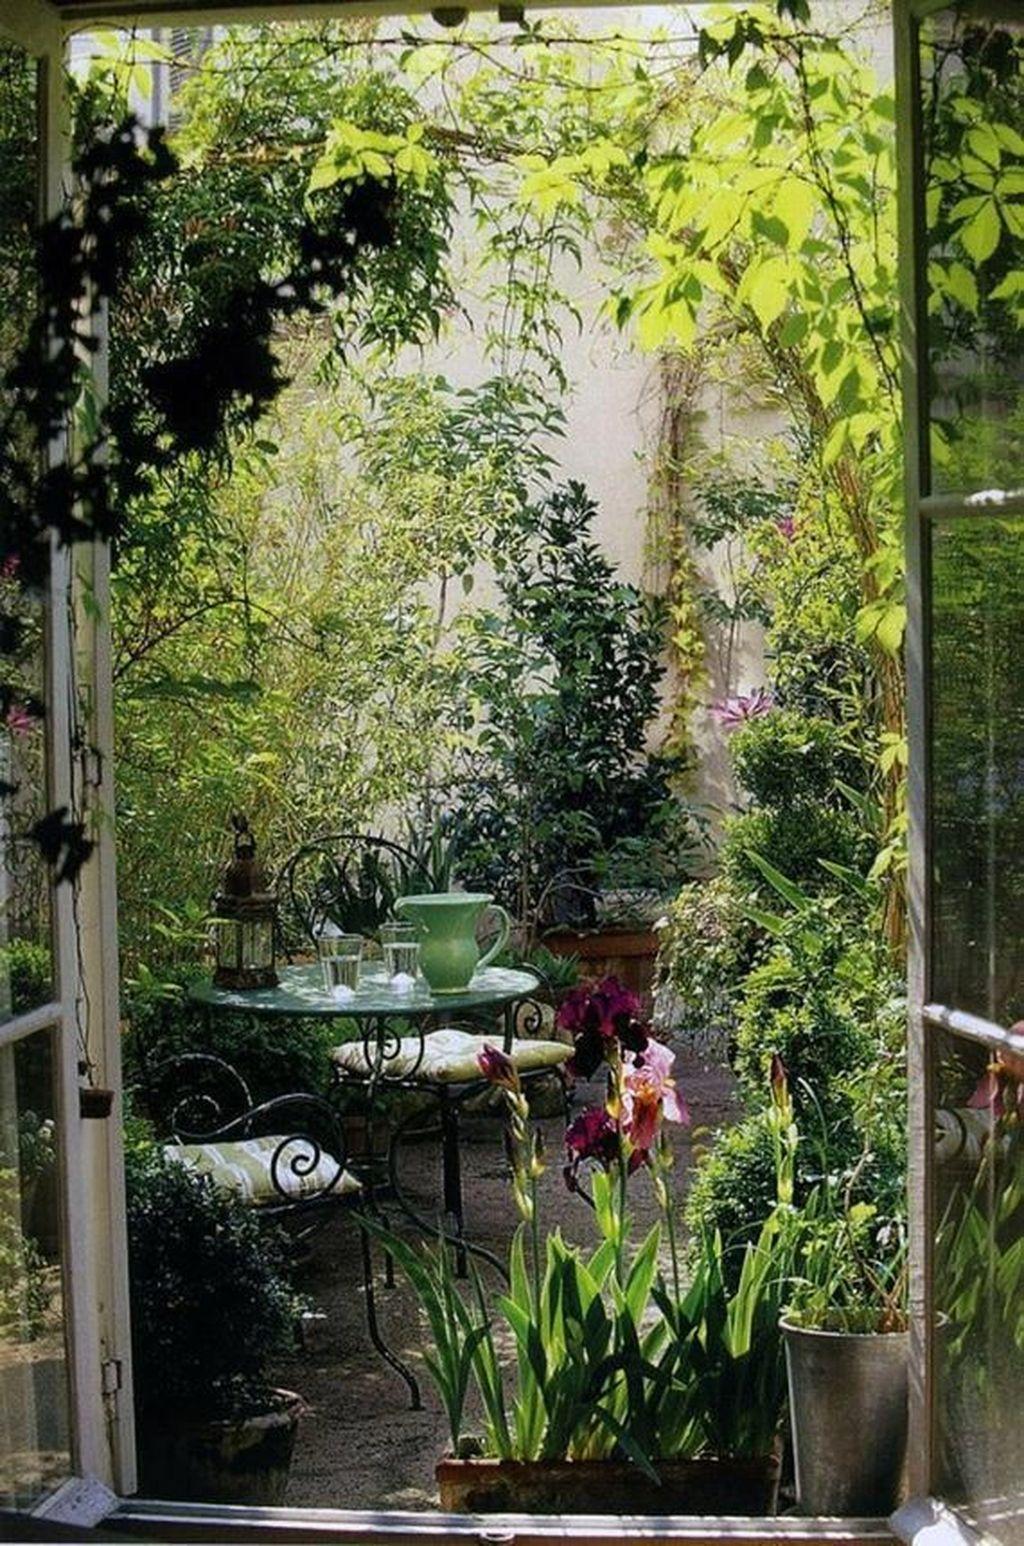 The Best Urban Garden Design Ideas For Your Backyard 07